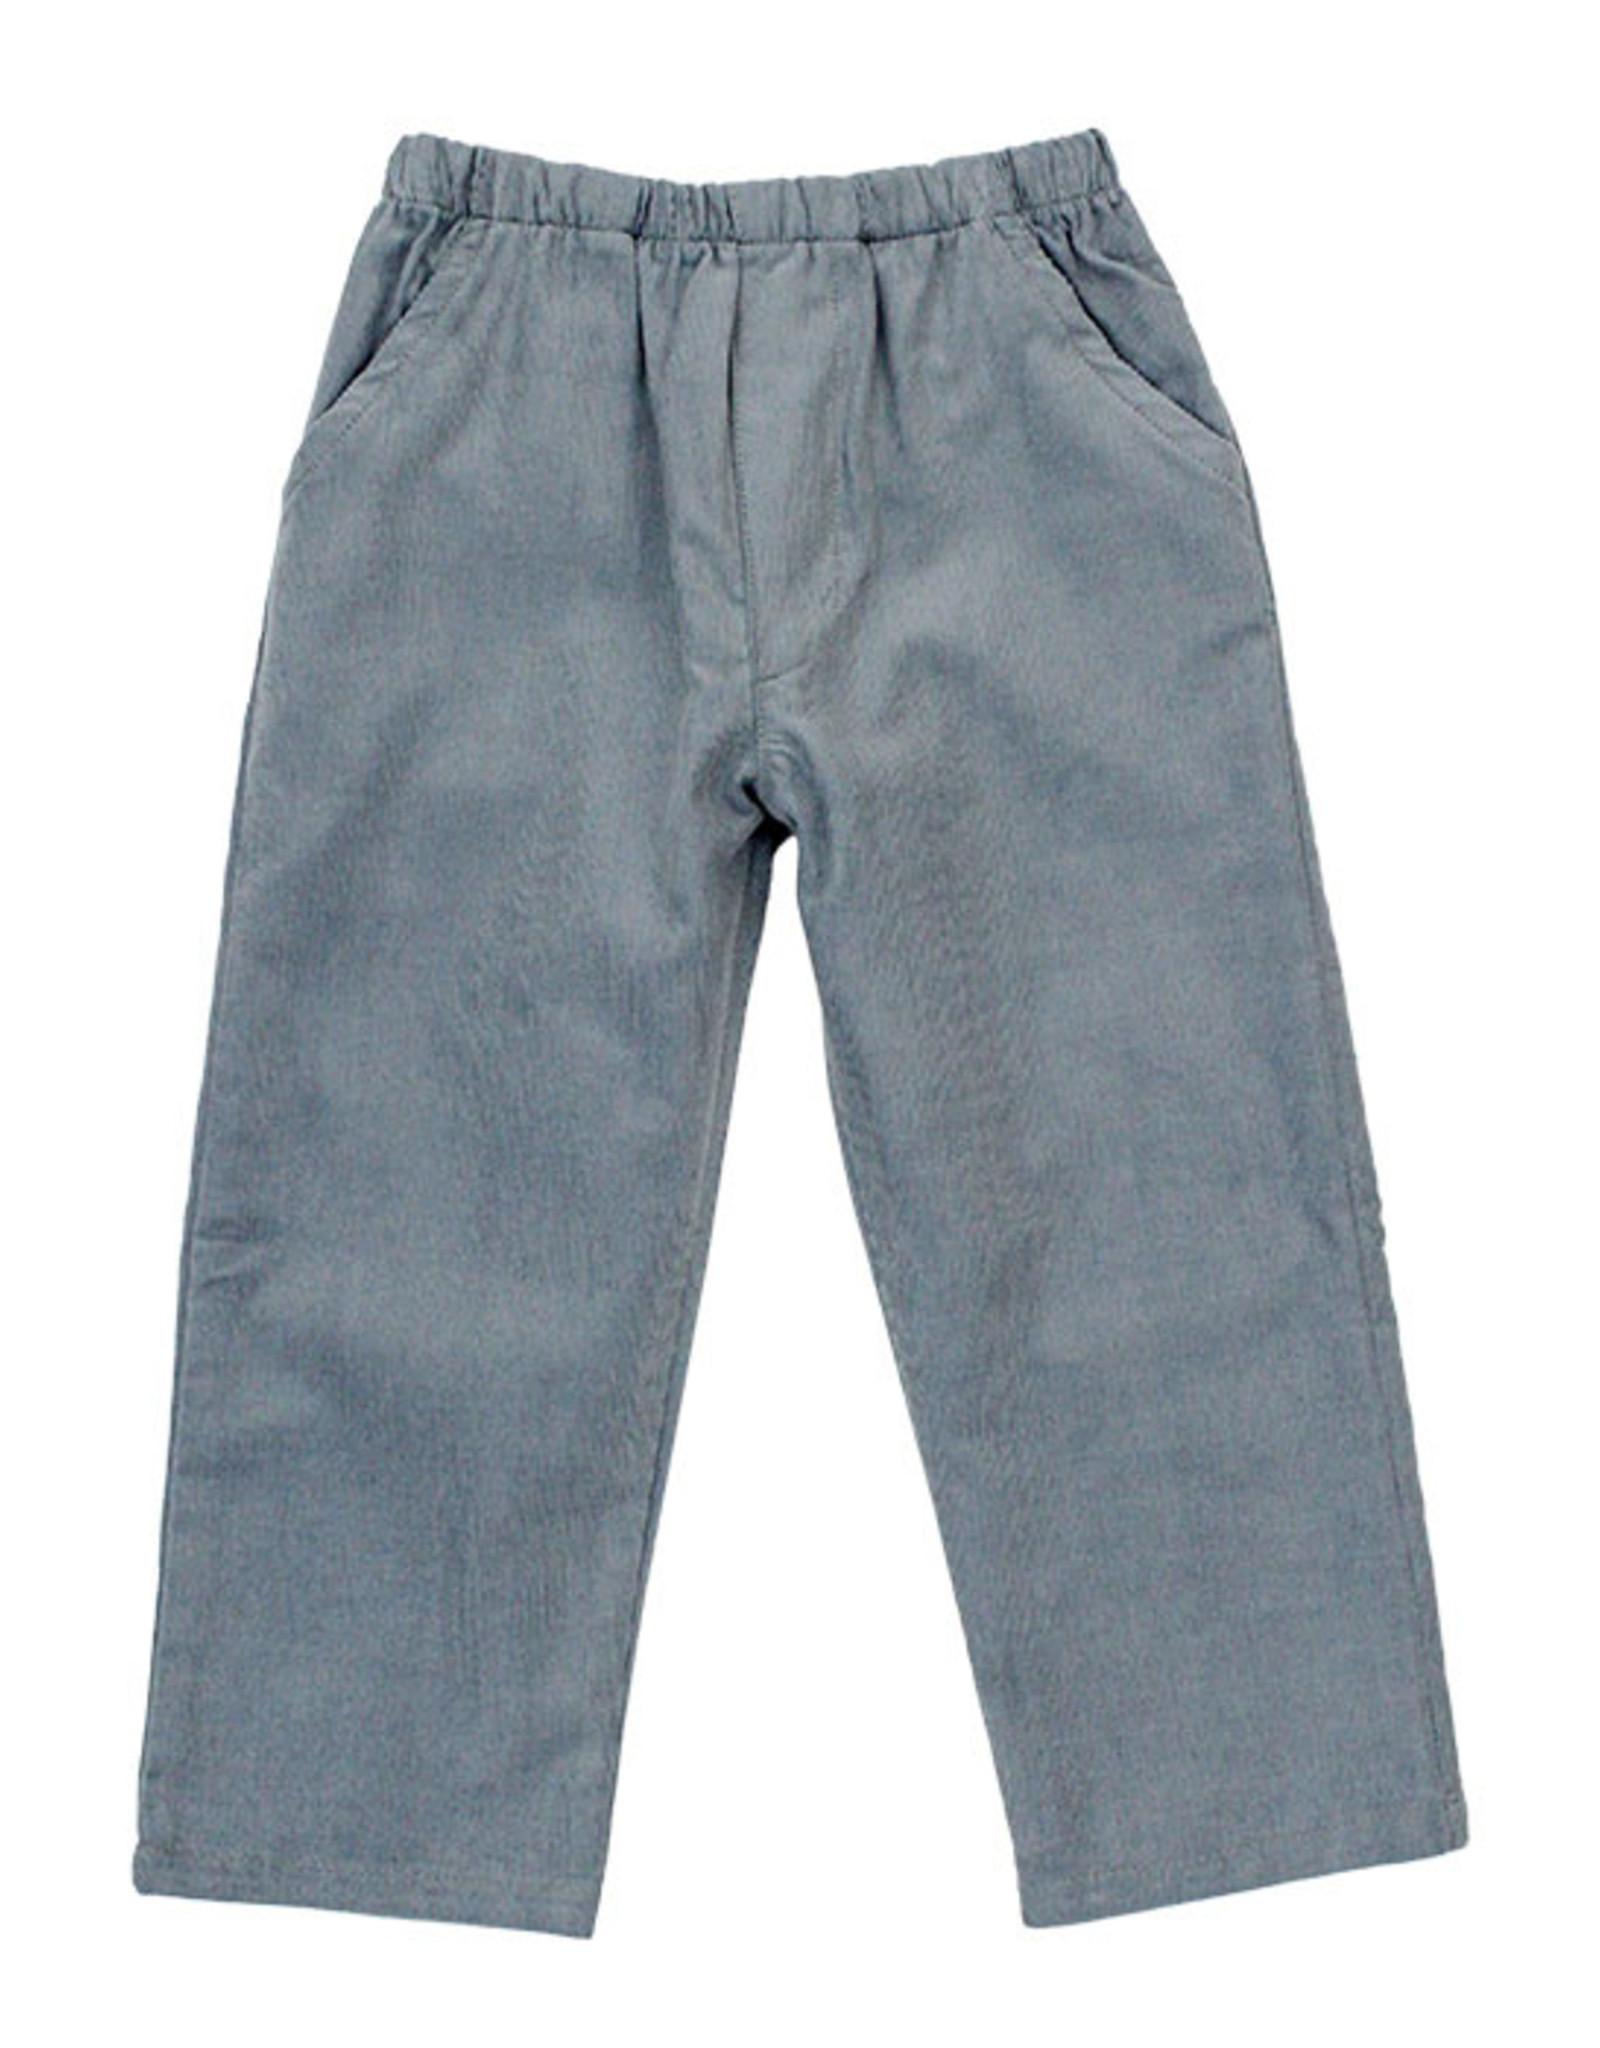 The Bailey Boys Grey Cord Elastic Pants